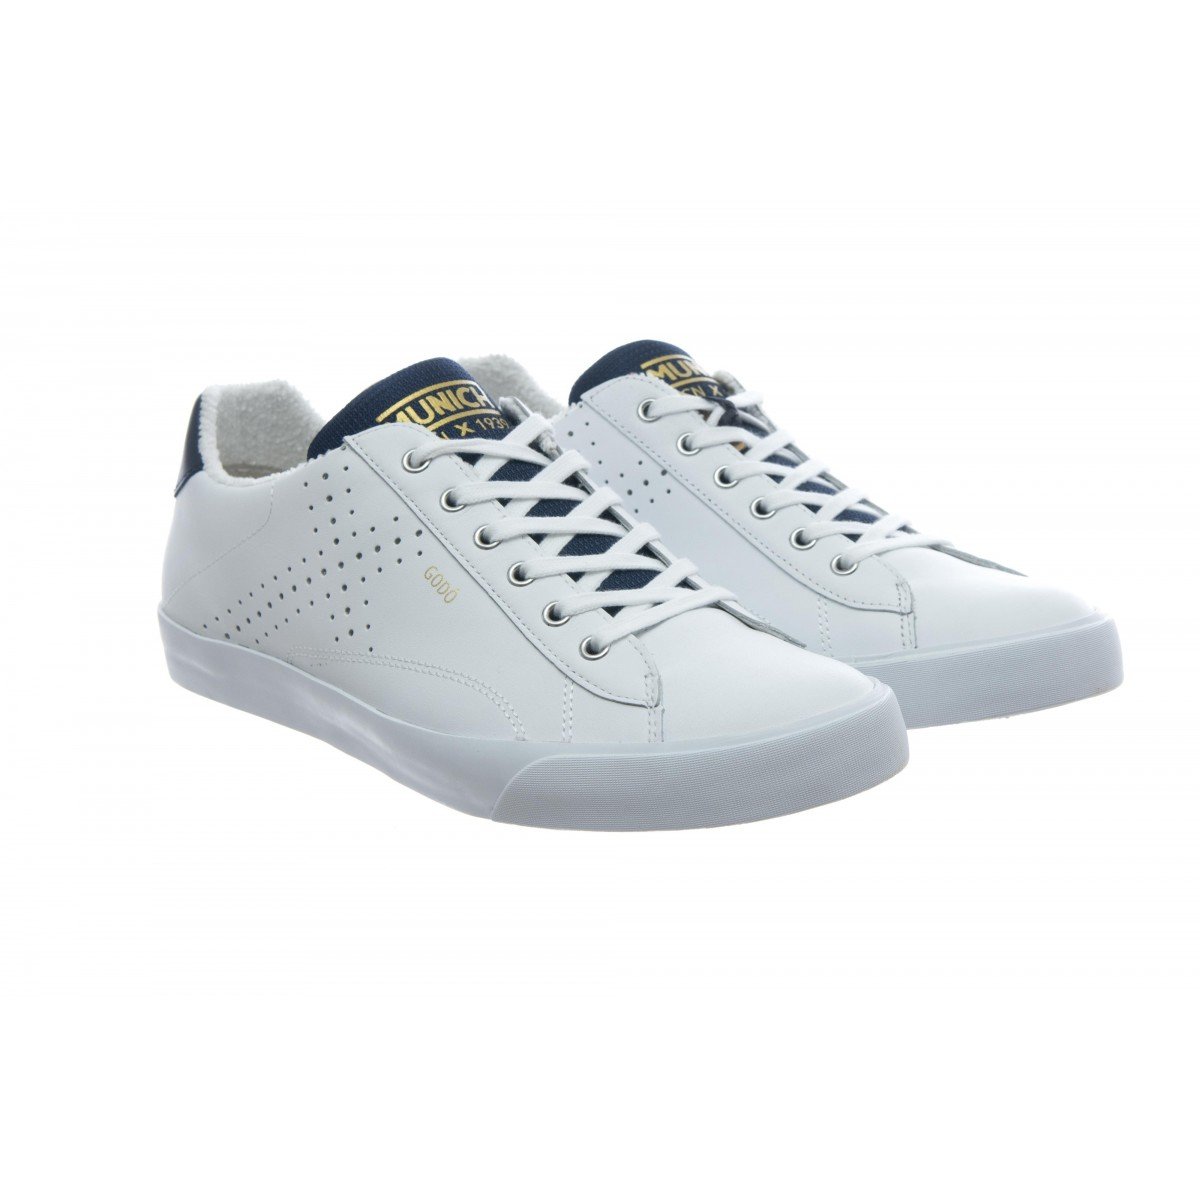 Scarpe - Godo sneakers pelle logo traforato